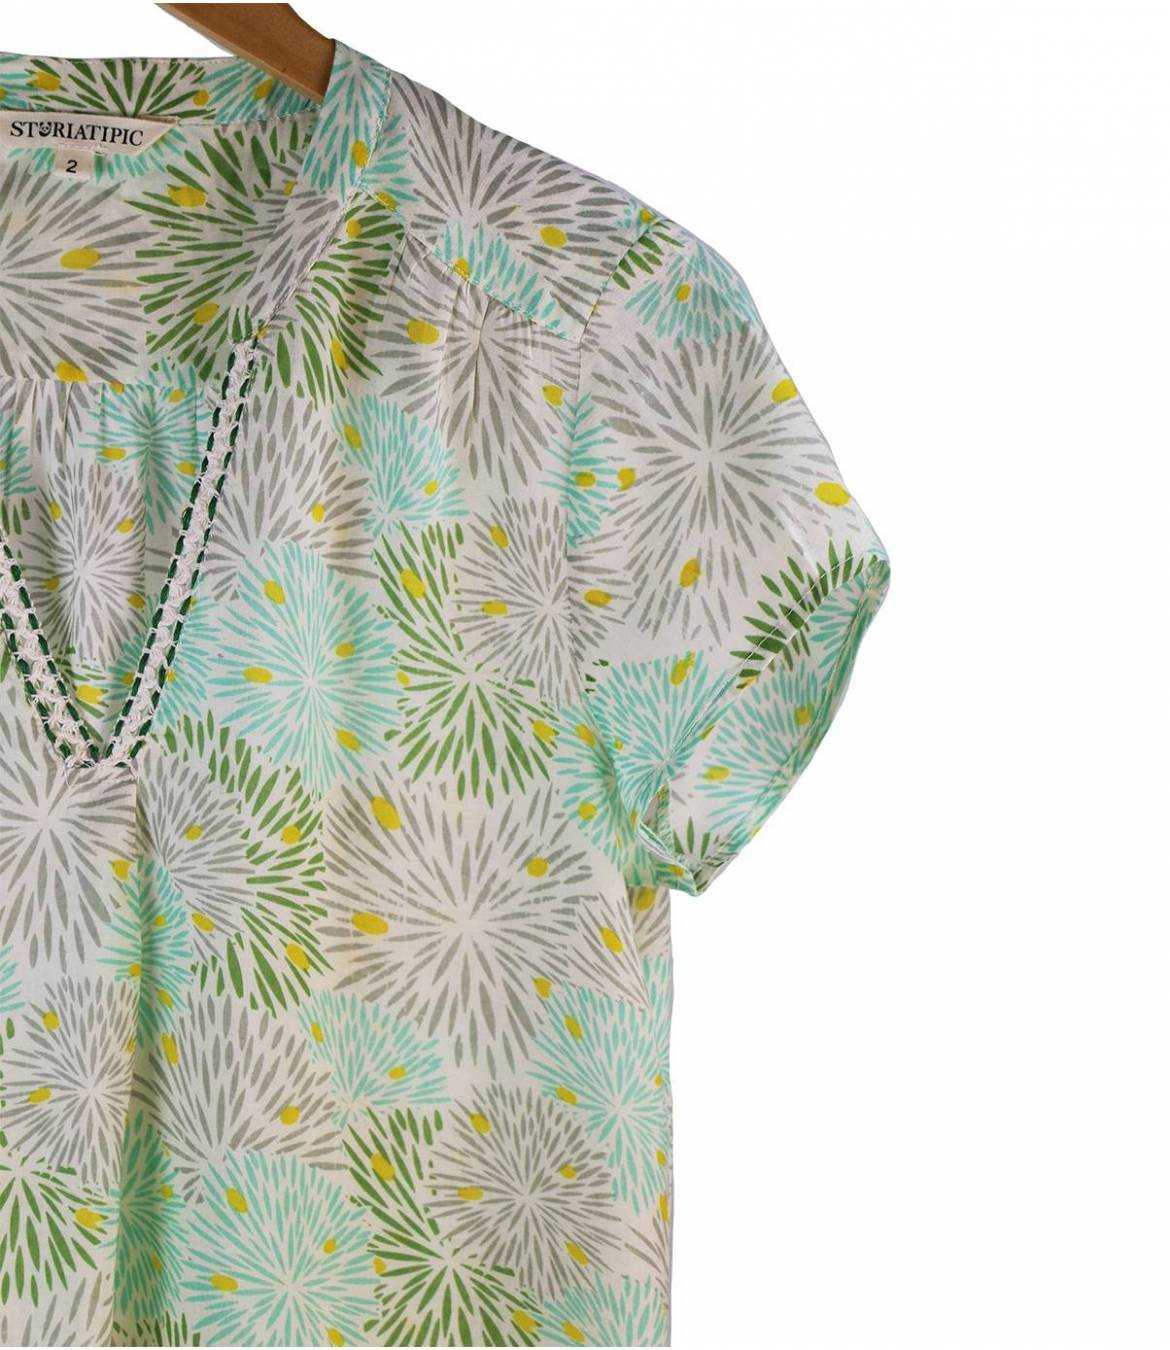 ZOE ECLAT Women's Modal T-shirt Storiatipic - 9